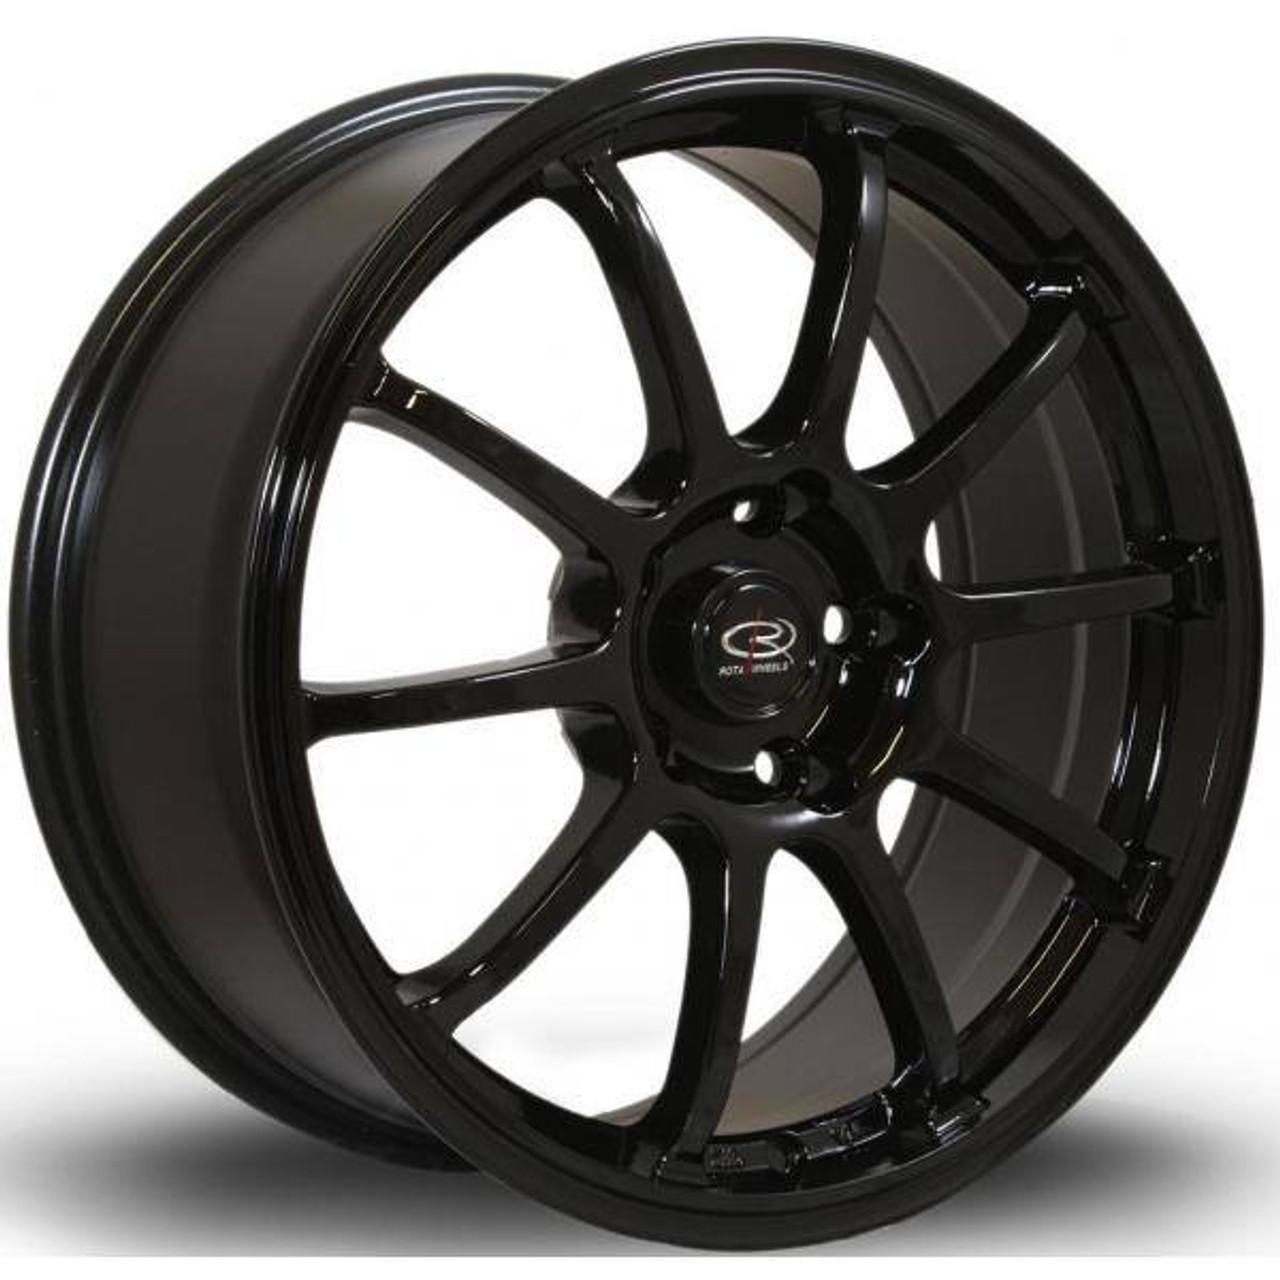 Rota Force Alloy Wheels Black